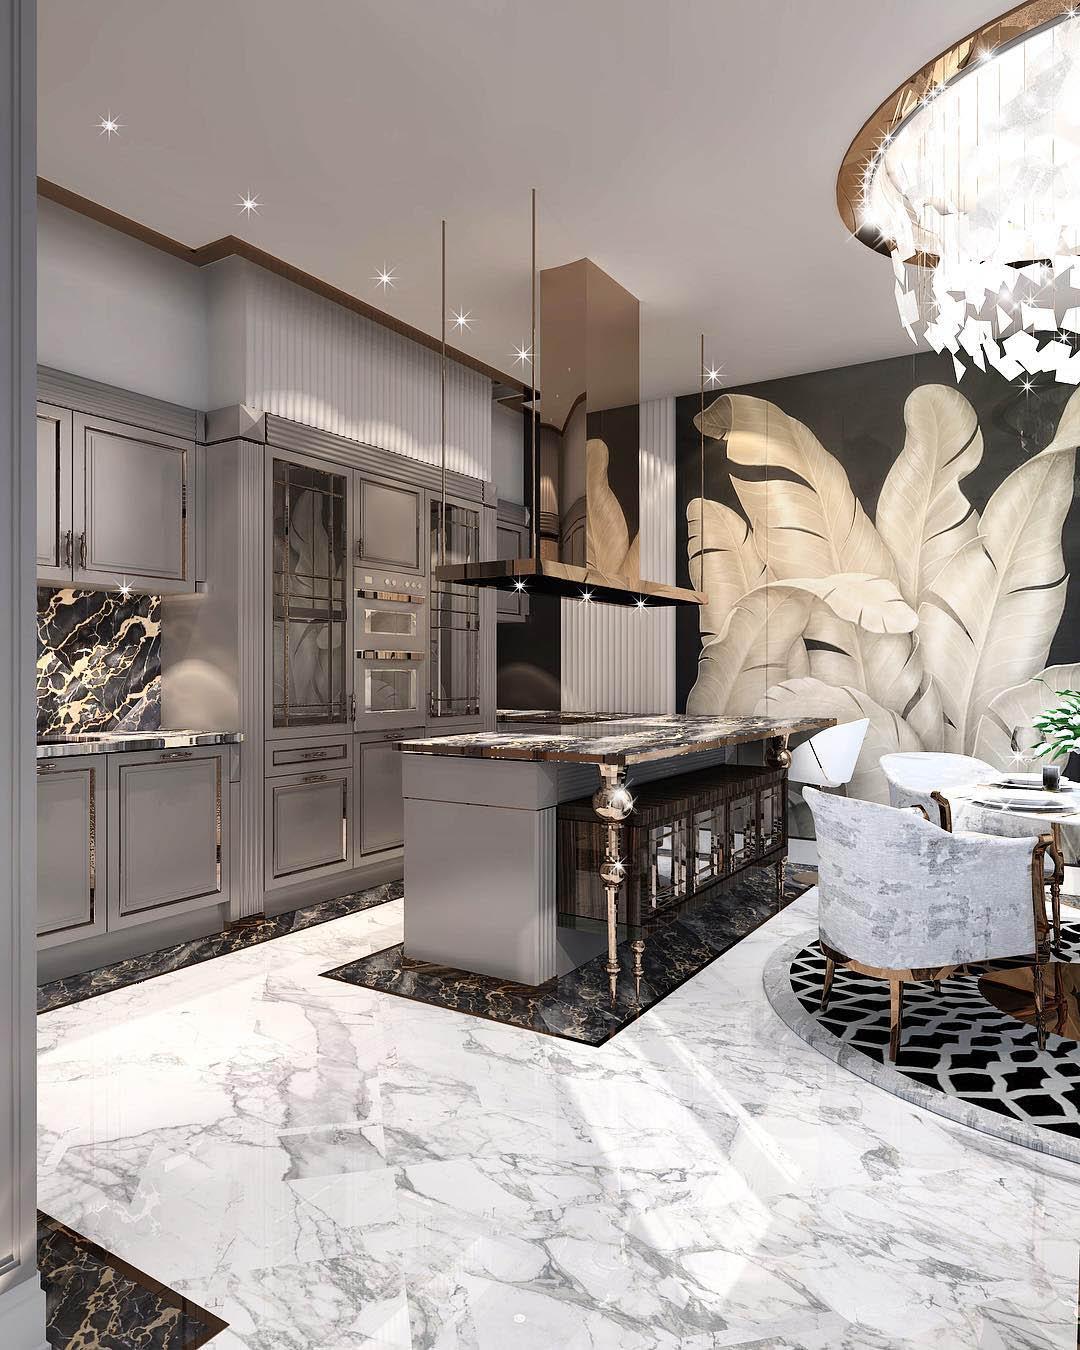 Constantin Frolov Interior Design | Glamorous Interiors